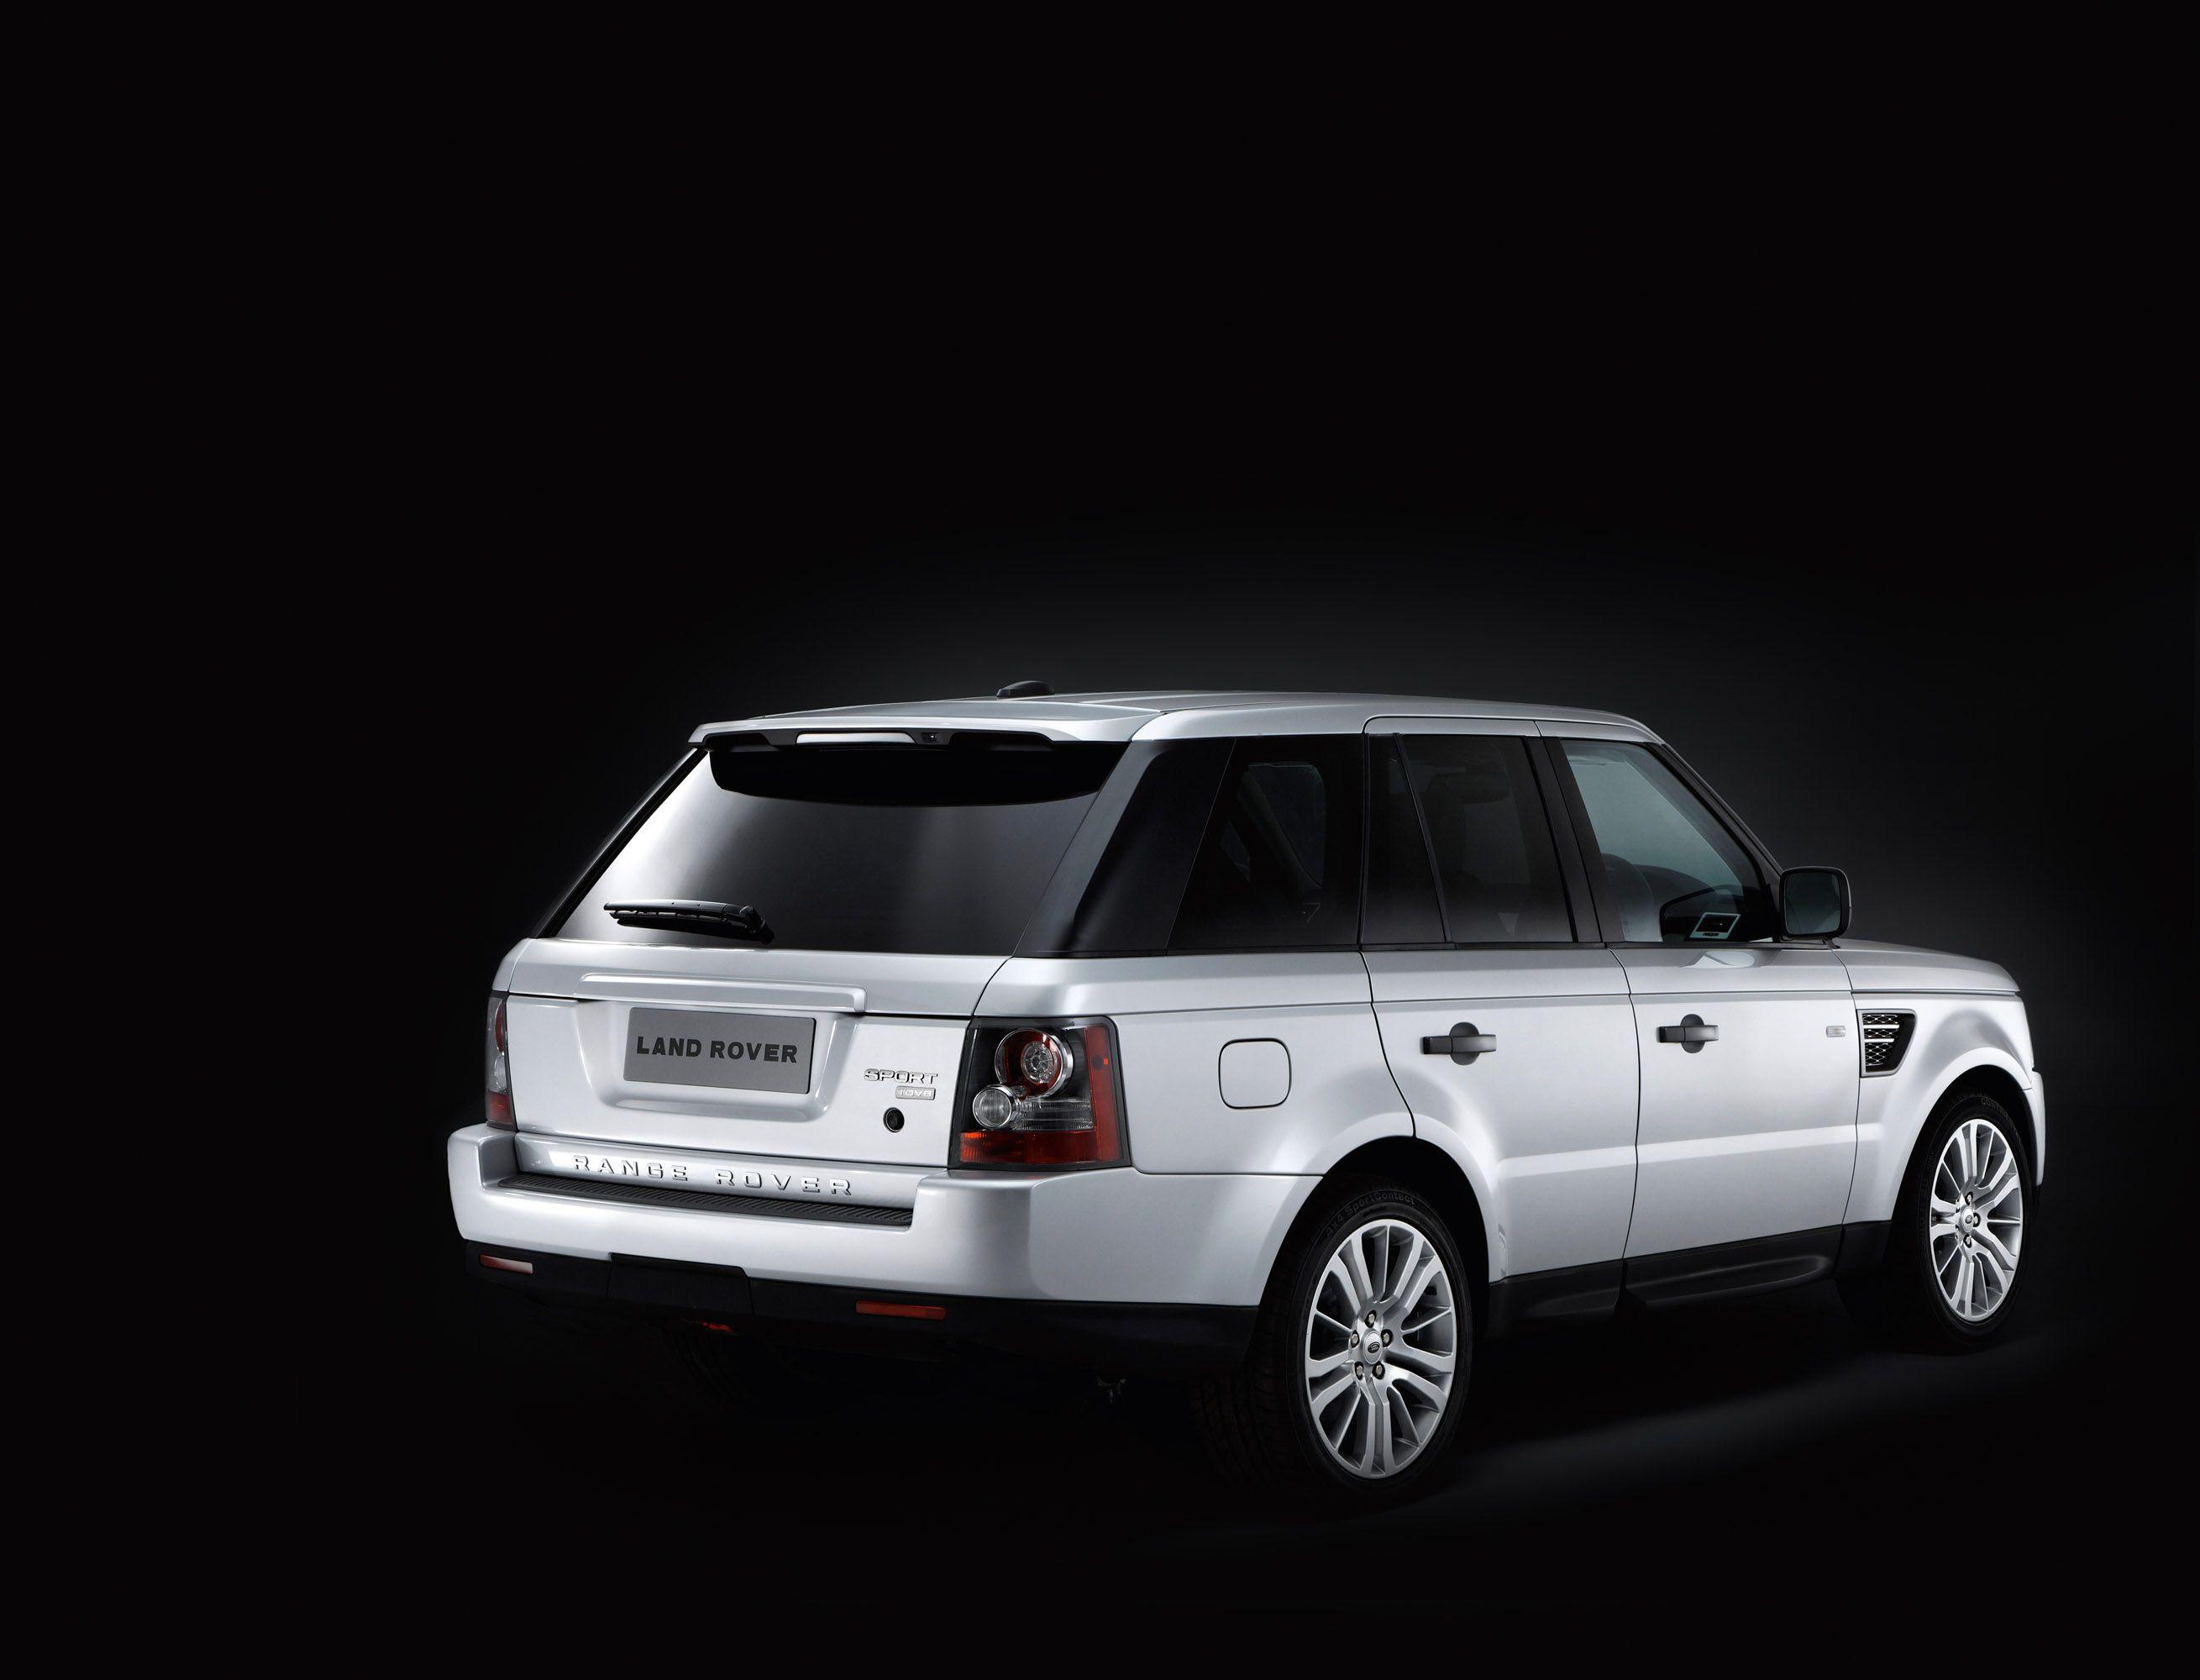 2010 Range Rover Sport Picture 18864